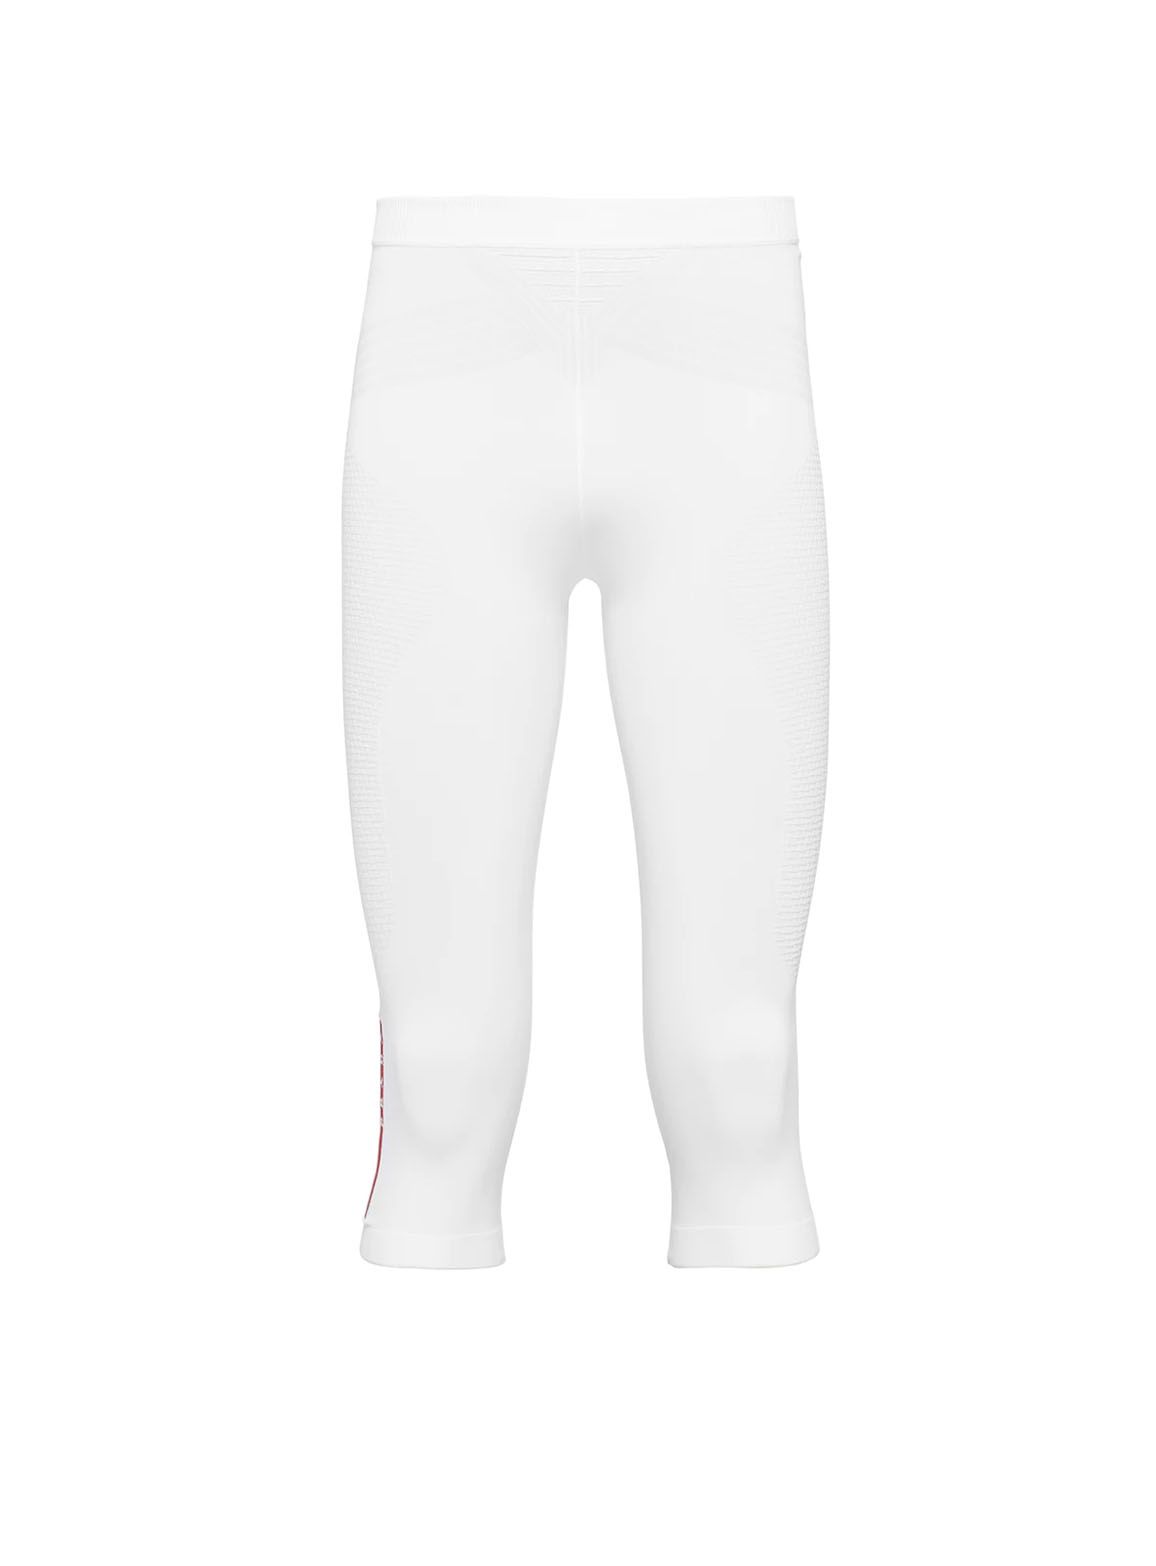 Soft Rec polyester leggings